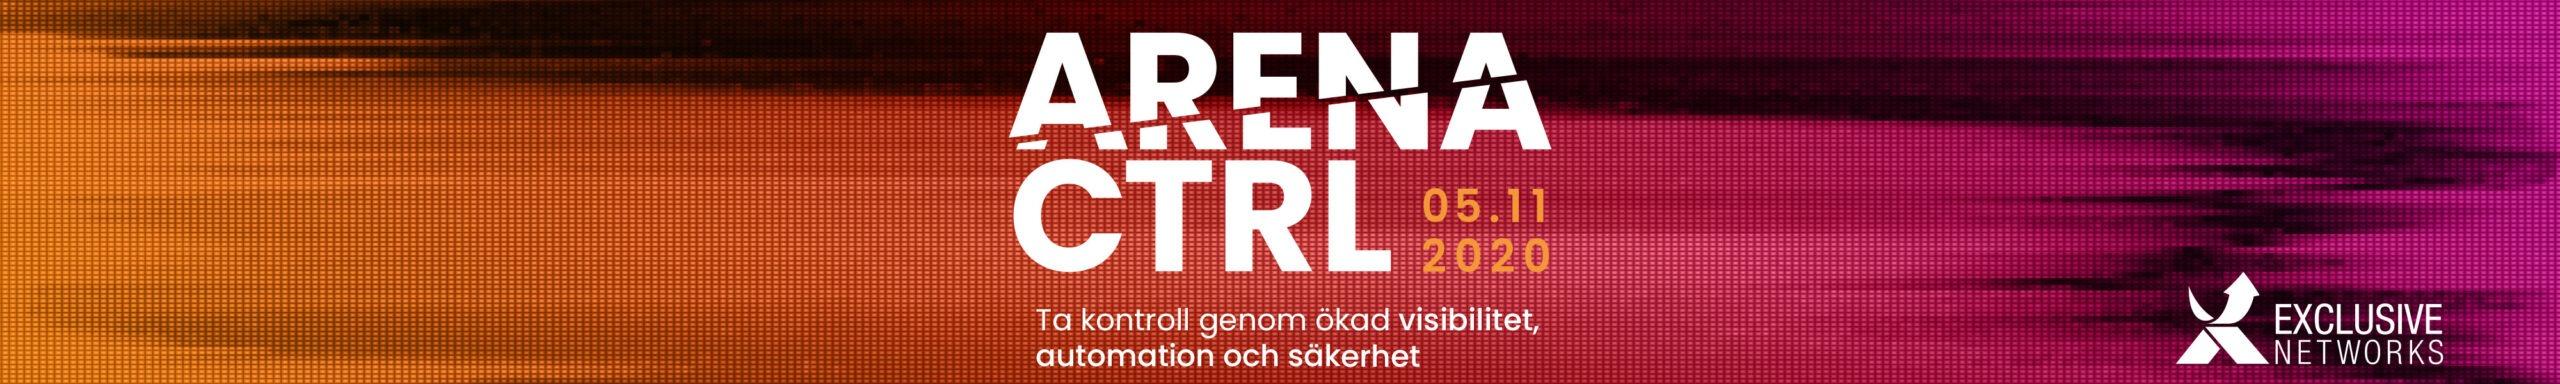 ARENA CTRL 05.11.2020 1